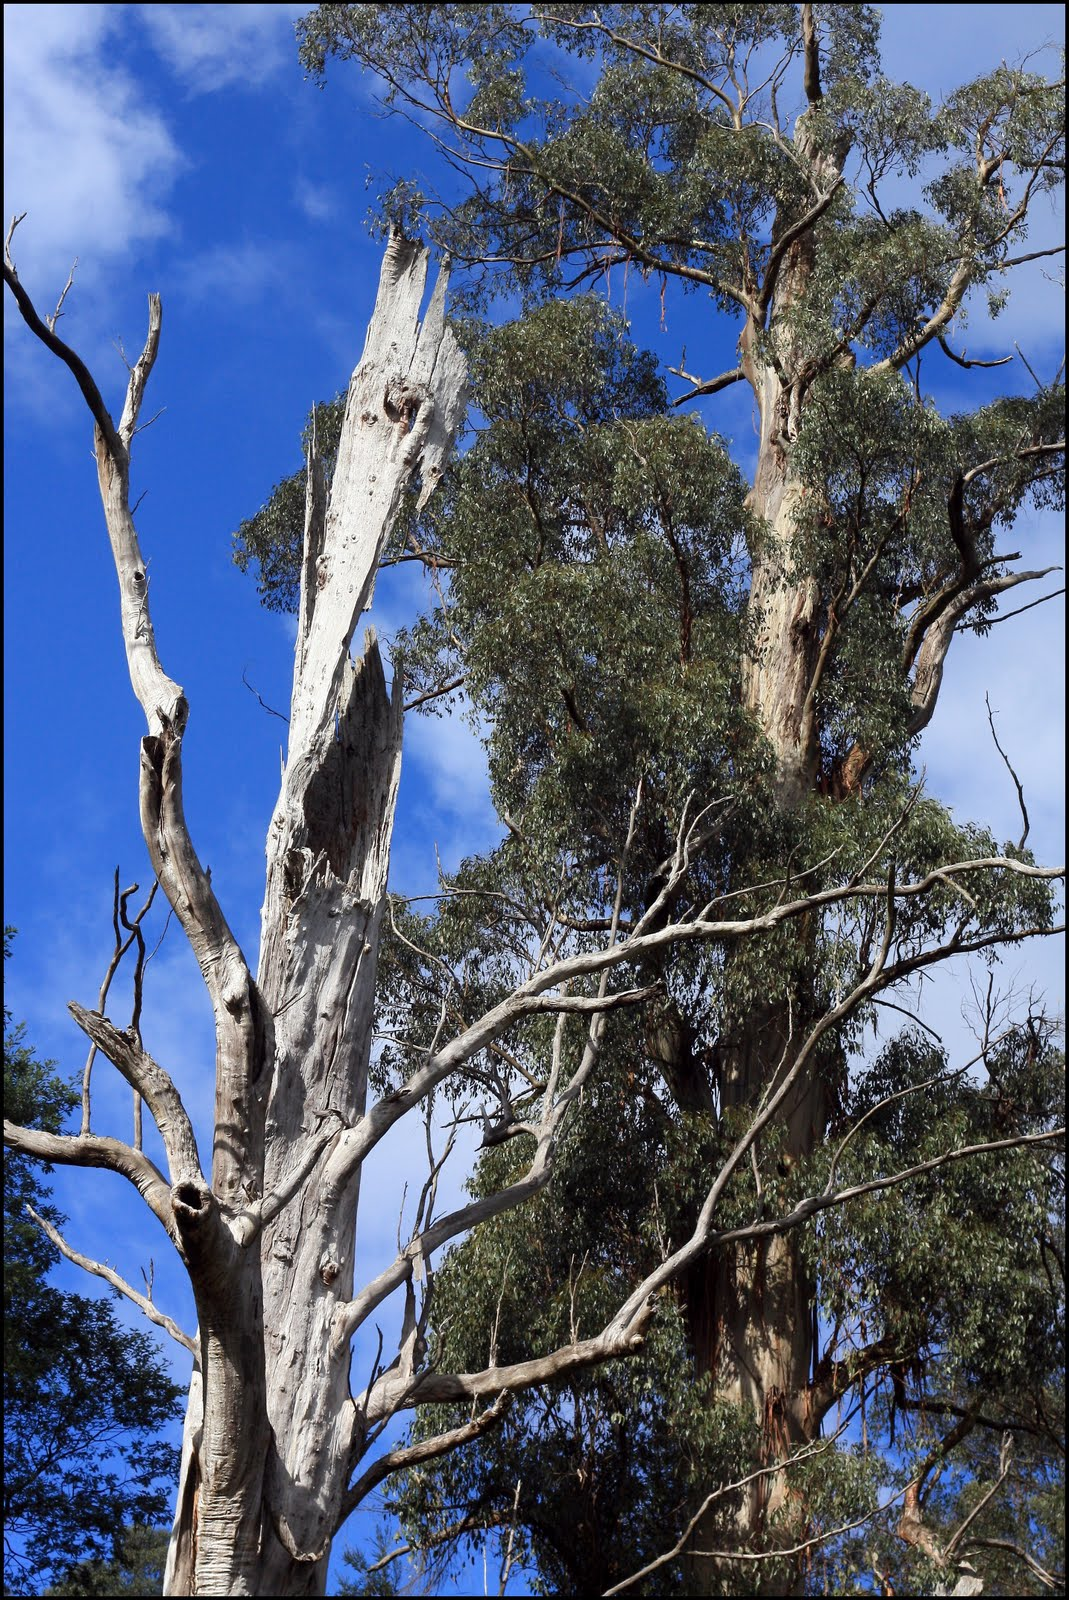 Hollow-bearing trees